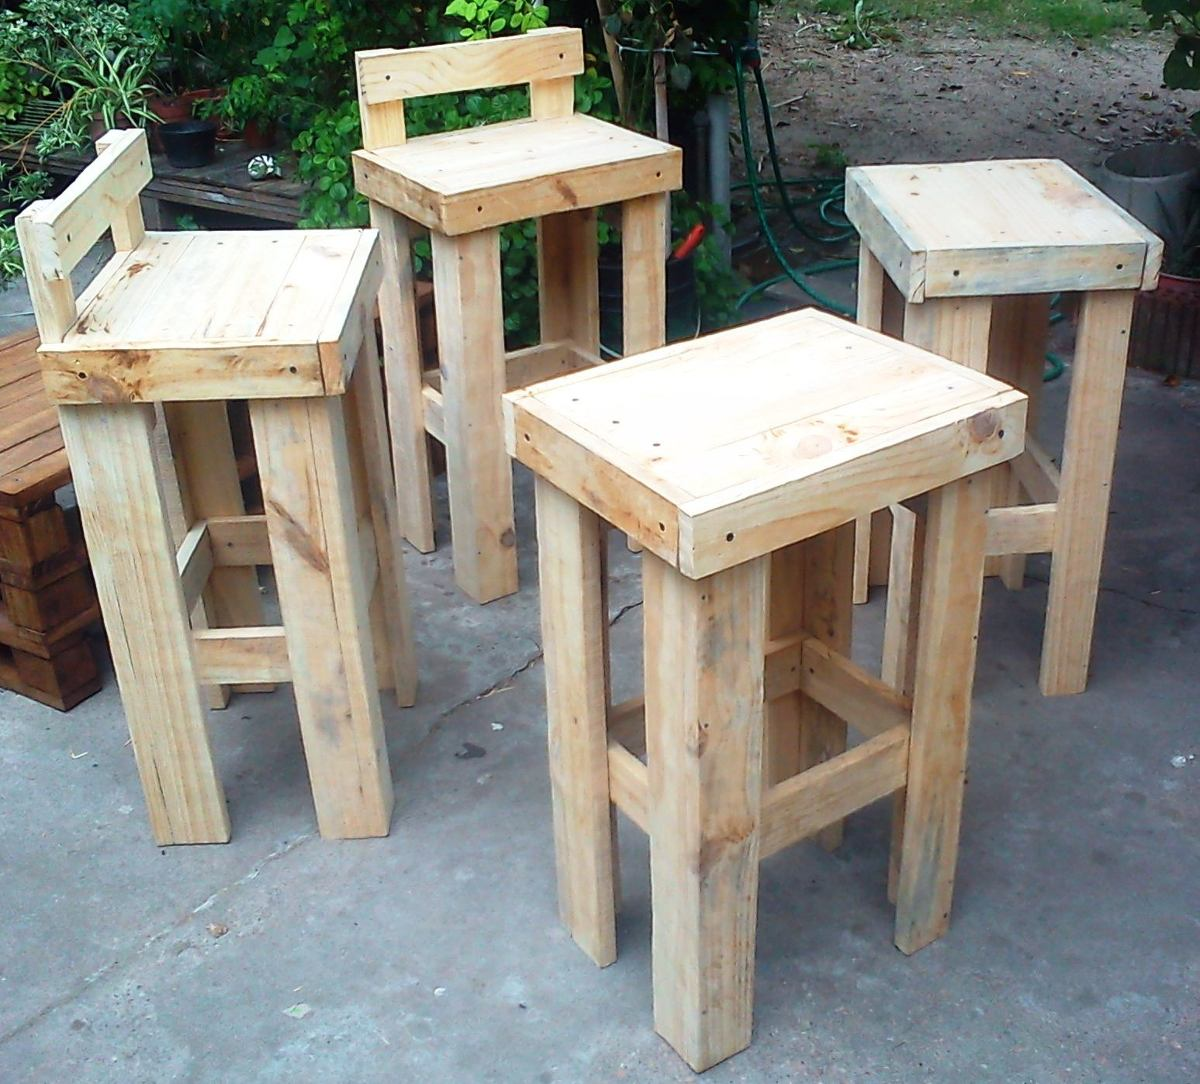 Taburete banca bar en madera de palet 490 00 en for Taburete bar madera